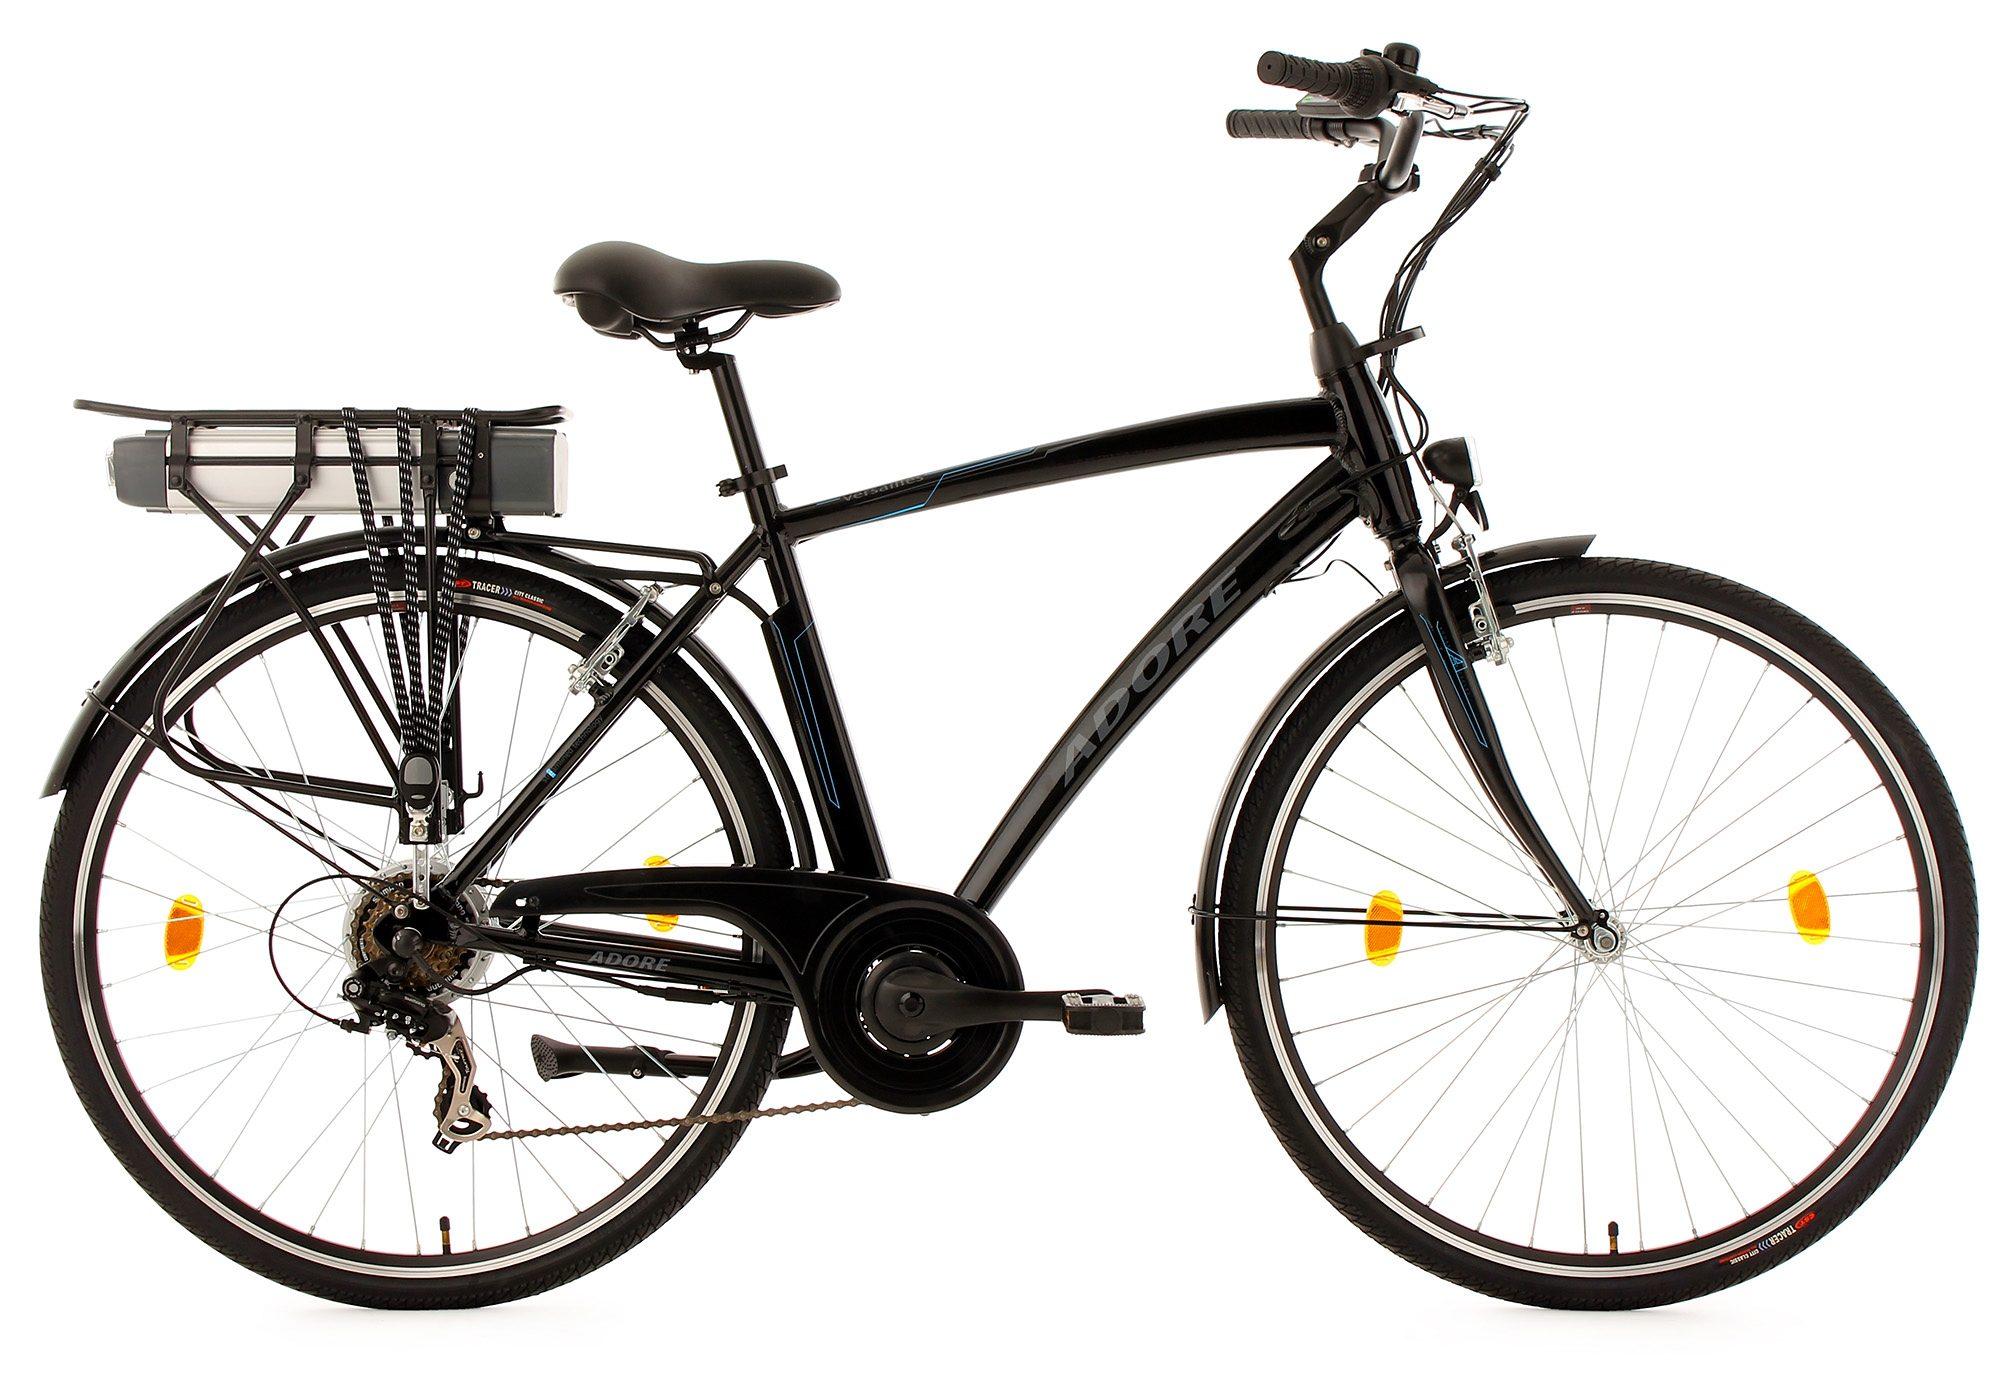 Adore Herren-E-Bike City, 28 Zoll, 7 Gänge, 250 Watt Li-Ion, 36V/10,4 Ah, schwarz, »Versailles«